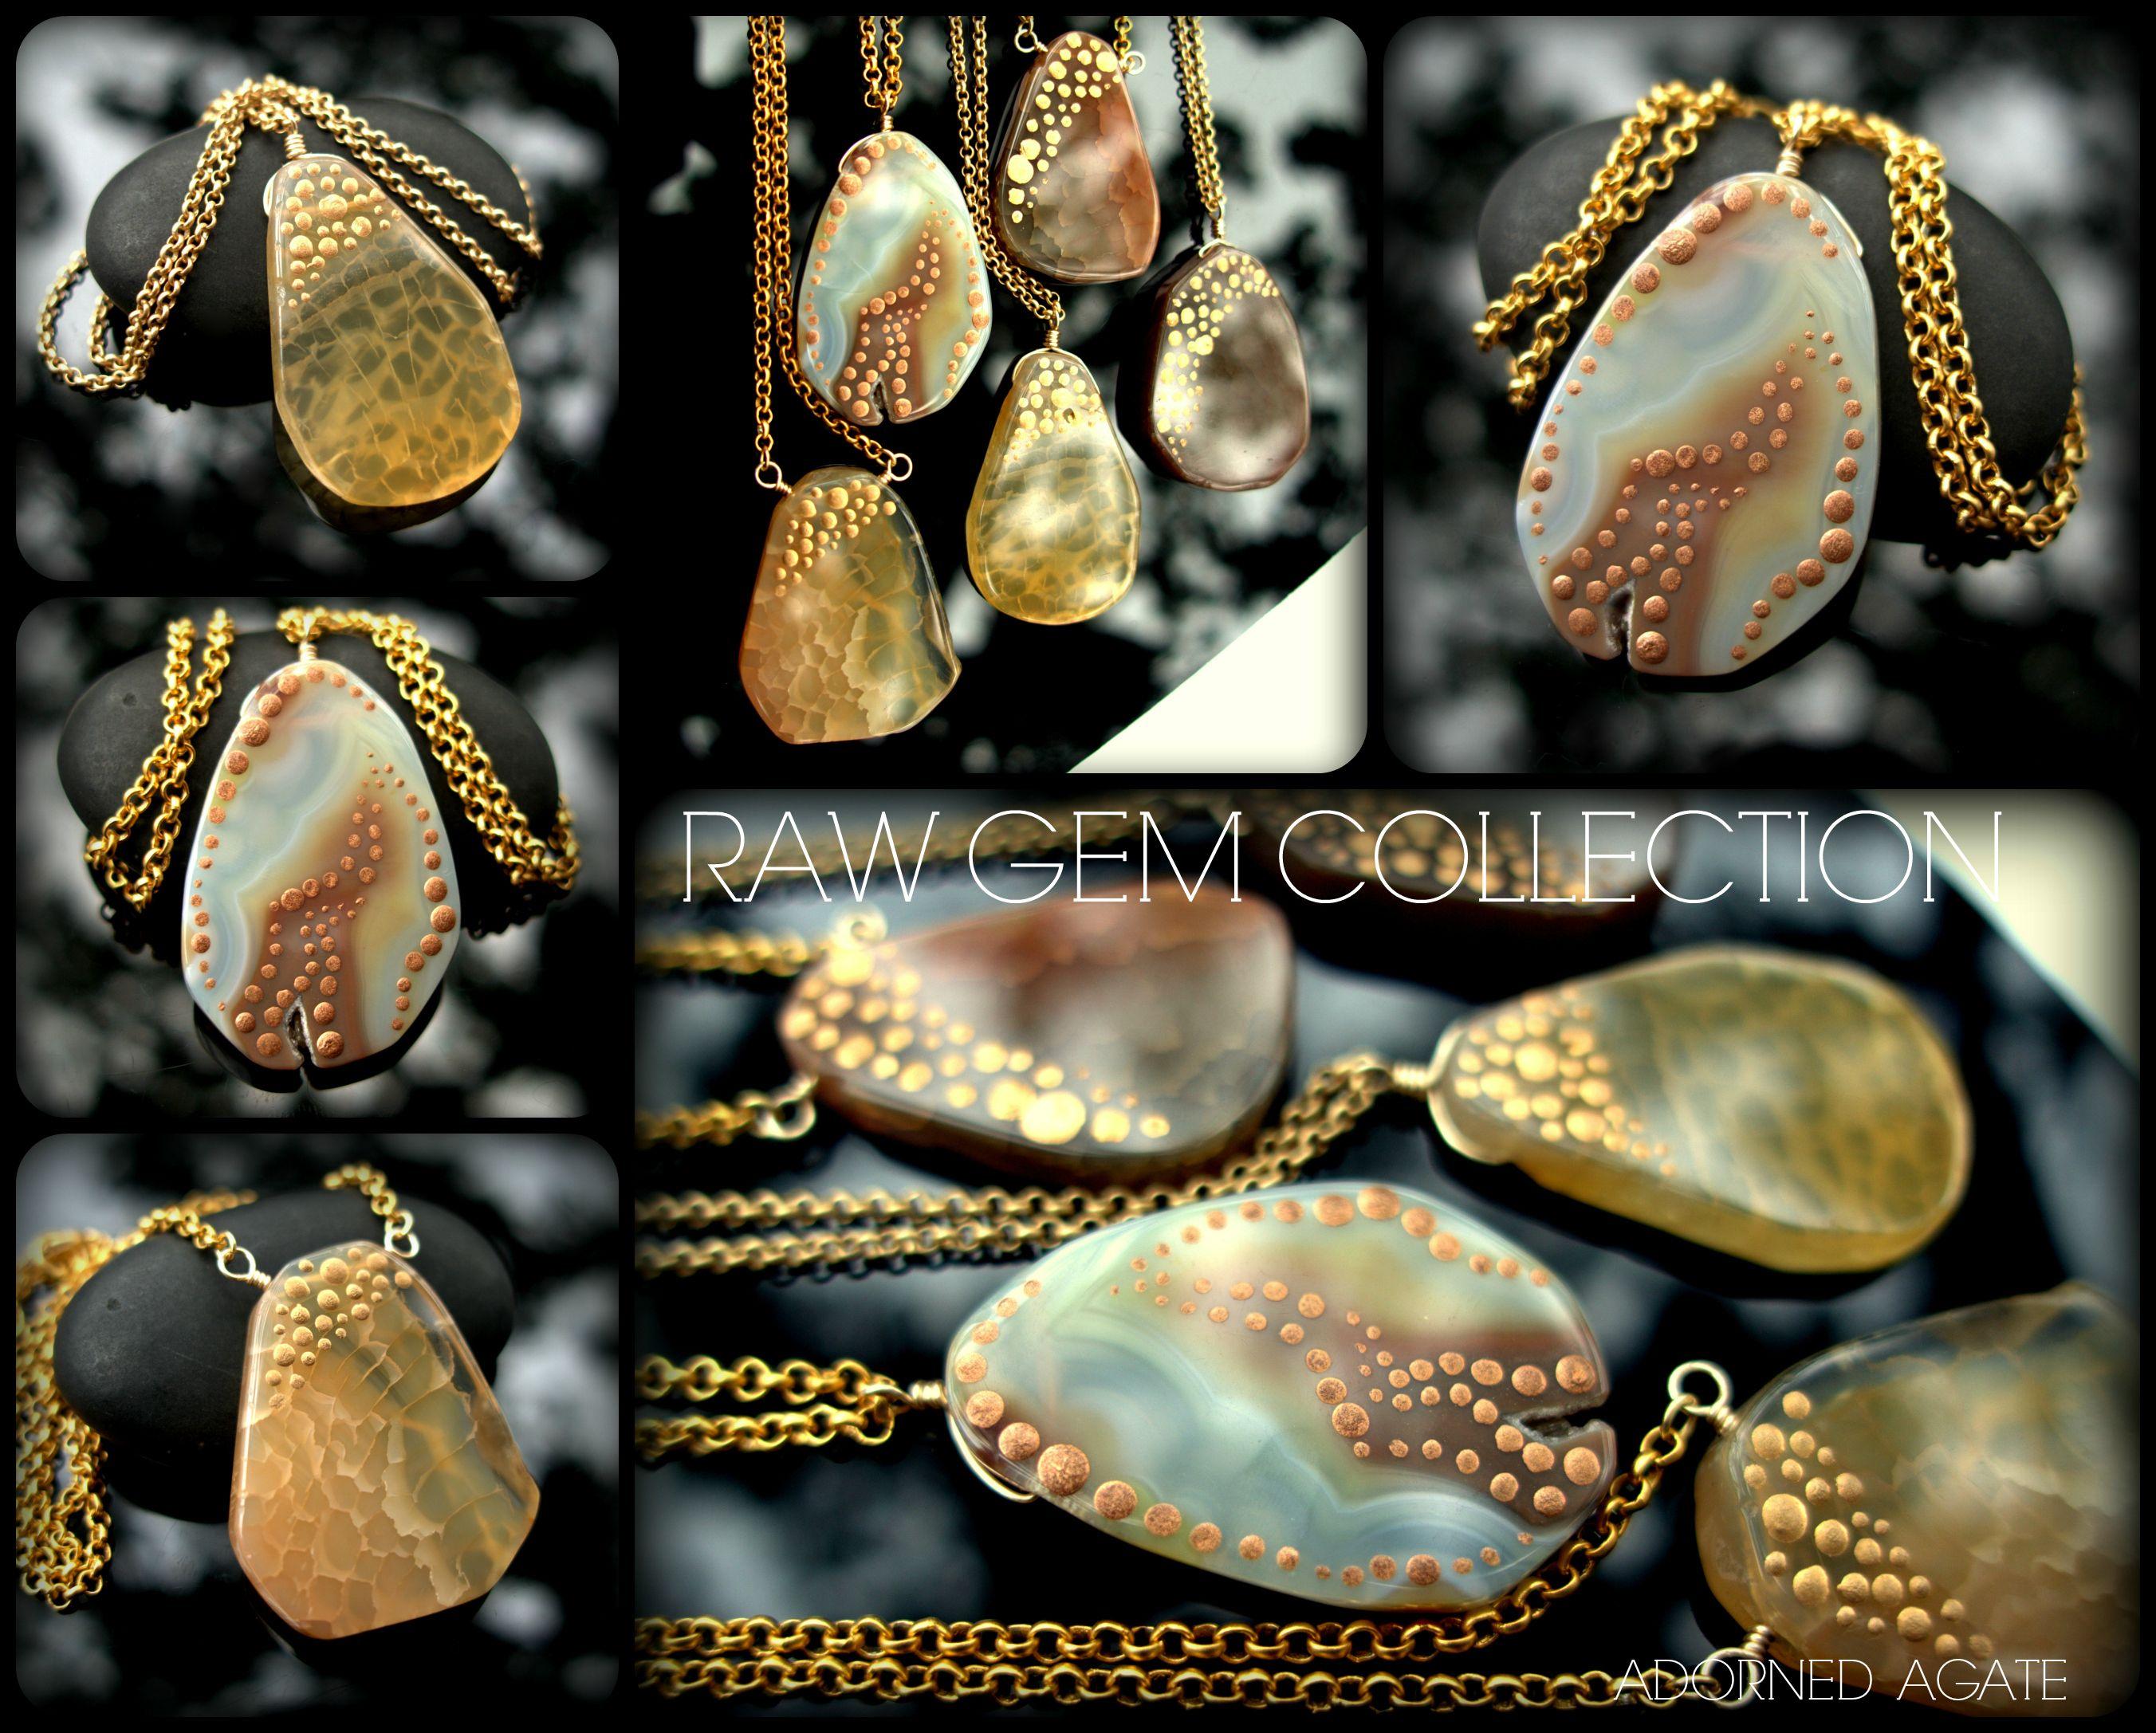 Raw Gem Look Book - Adorned Agate Slice - ShannonTJewelry.com  #rawgem #rawcrystal #crystalpoints #roughgem #roughcrystal #bohonecklace #bohojewelry #bohopendant #bohocrystal #bohochic #bohemianjewelry #hippiejewelry #hippienecklace #hippiependant #festivalfashion #agate #rawstone #rawagate #rawmineral #shannontjewelry #champagne #champangenecklace